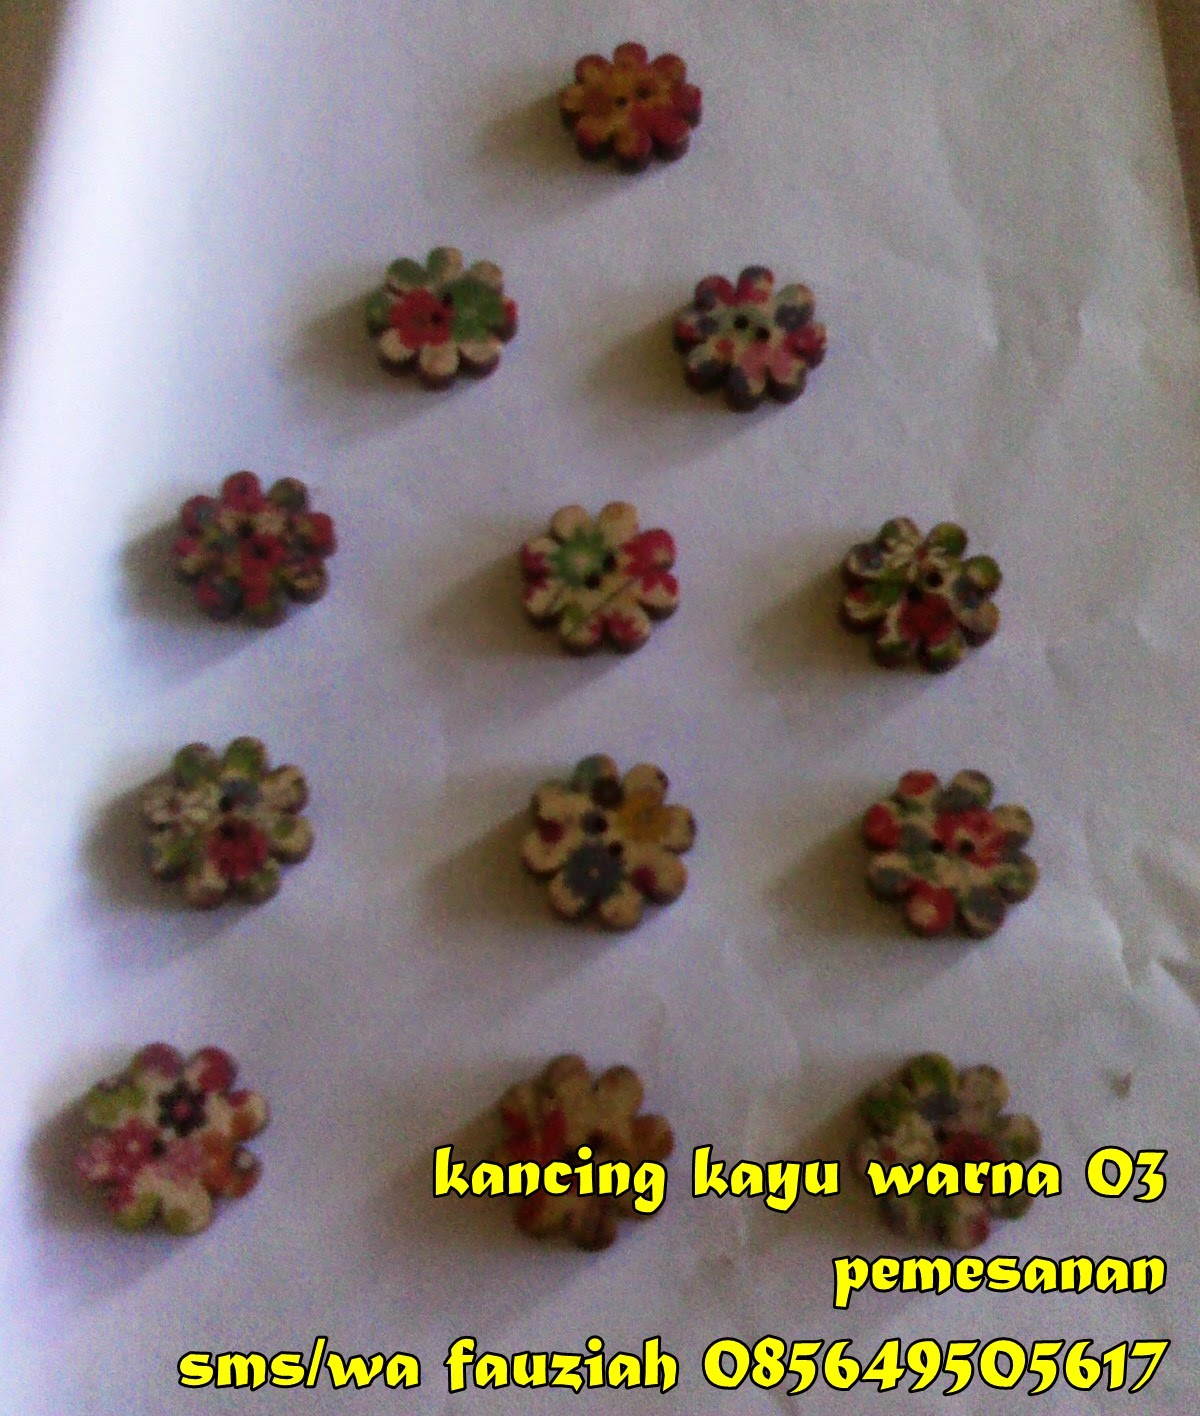 kancing Kayu Warna